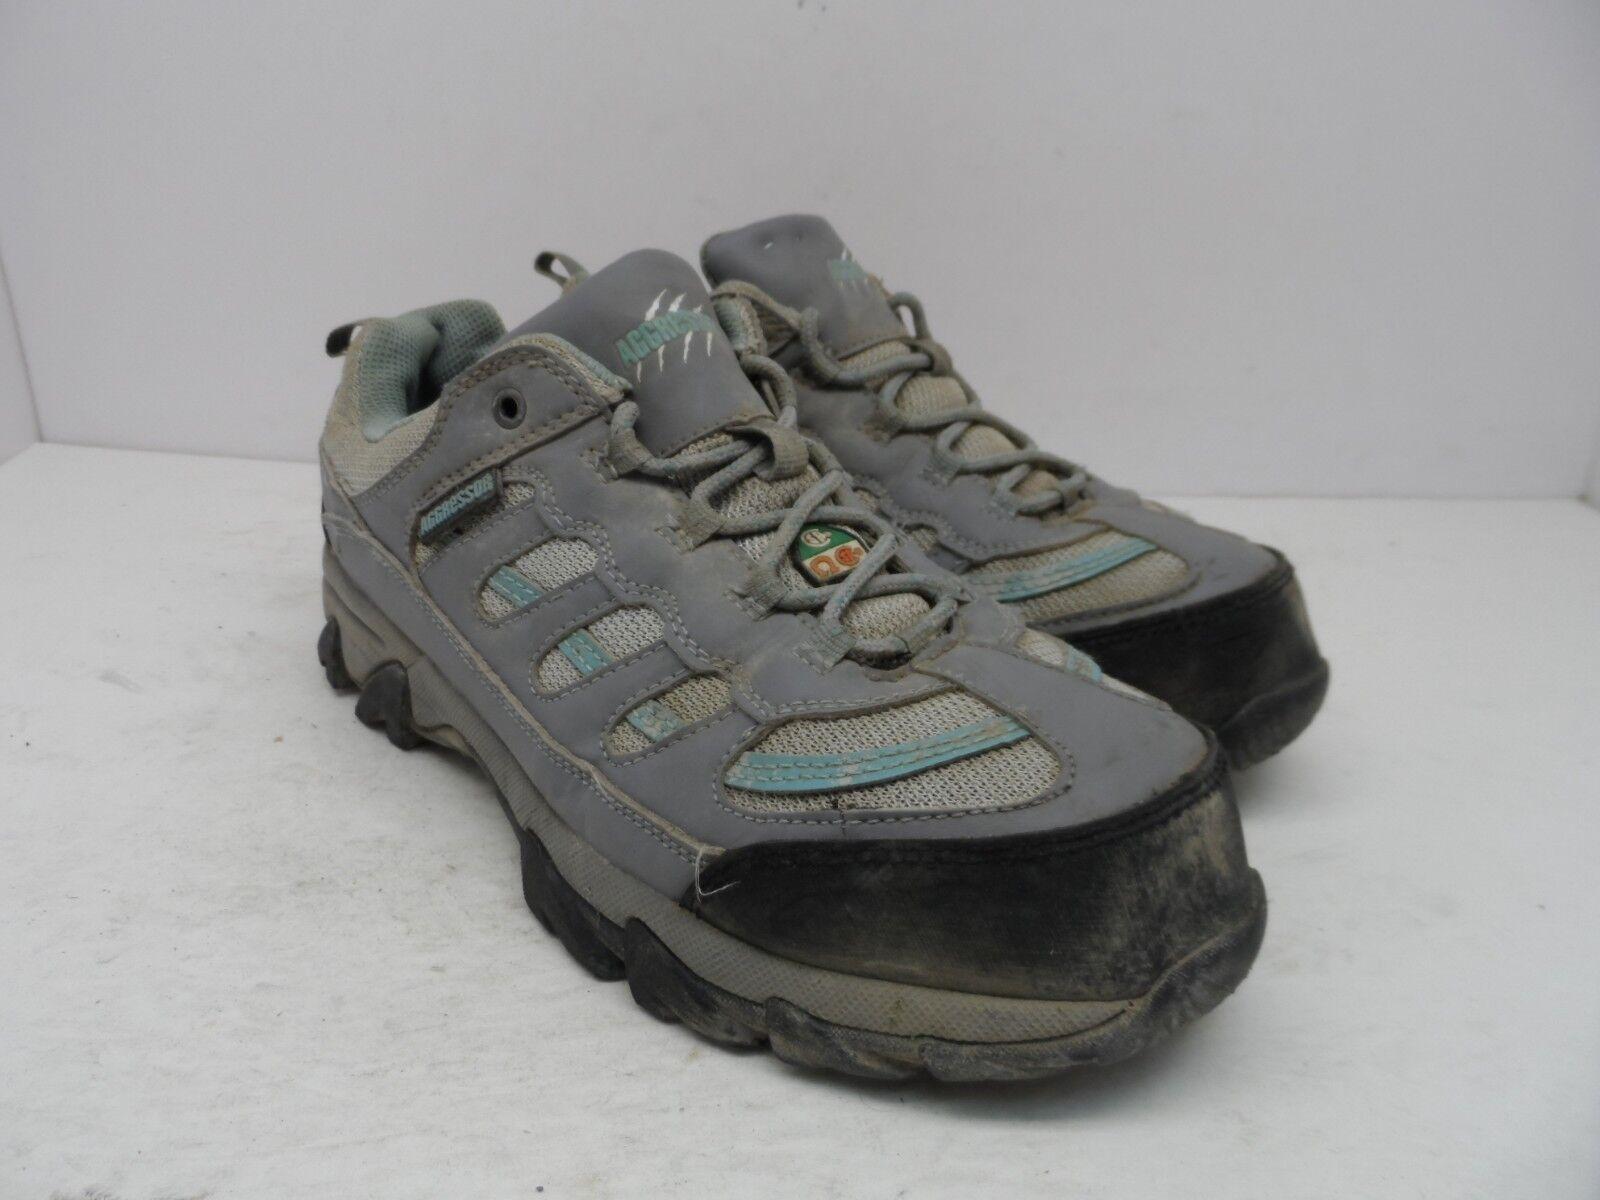 Aggressor Women's Steel Toe Steel Plate Approach Hiking Shoes Grey/Blue Size 9M